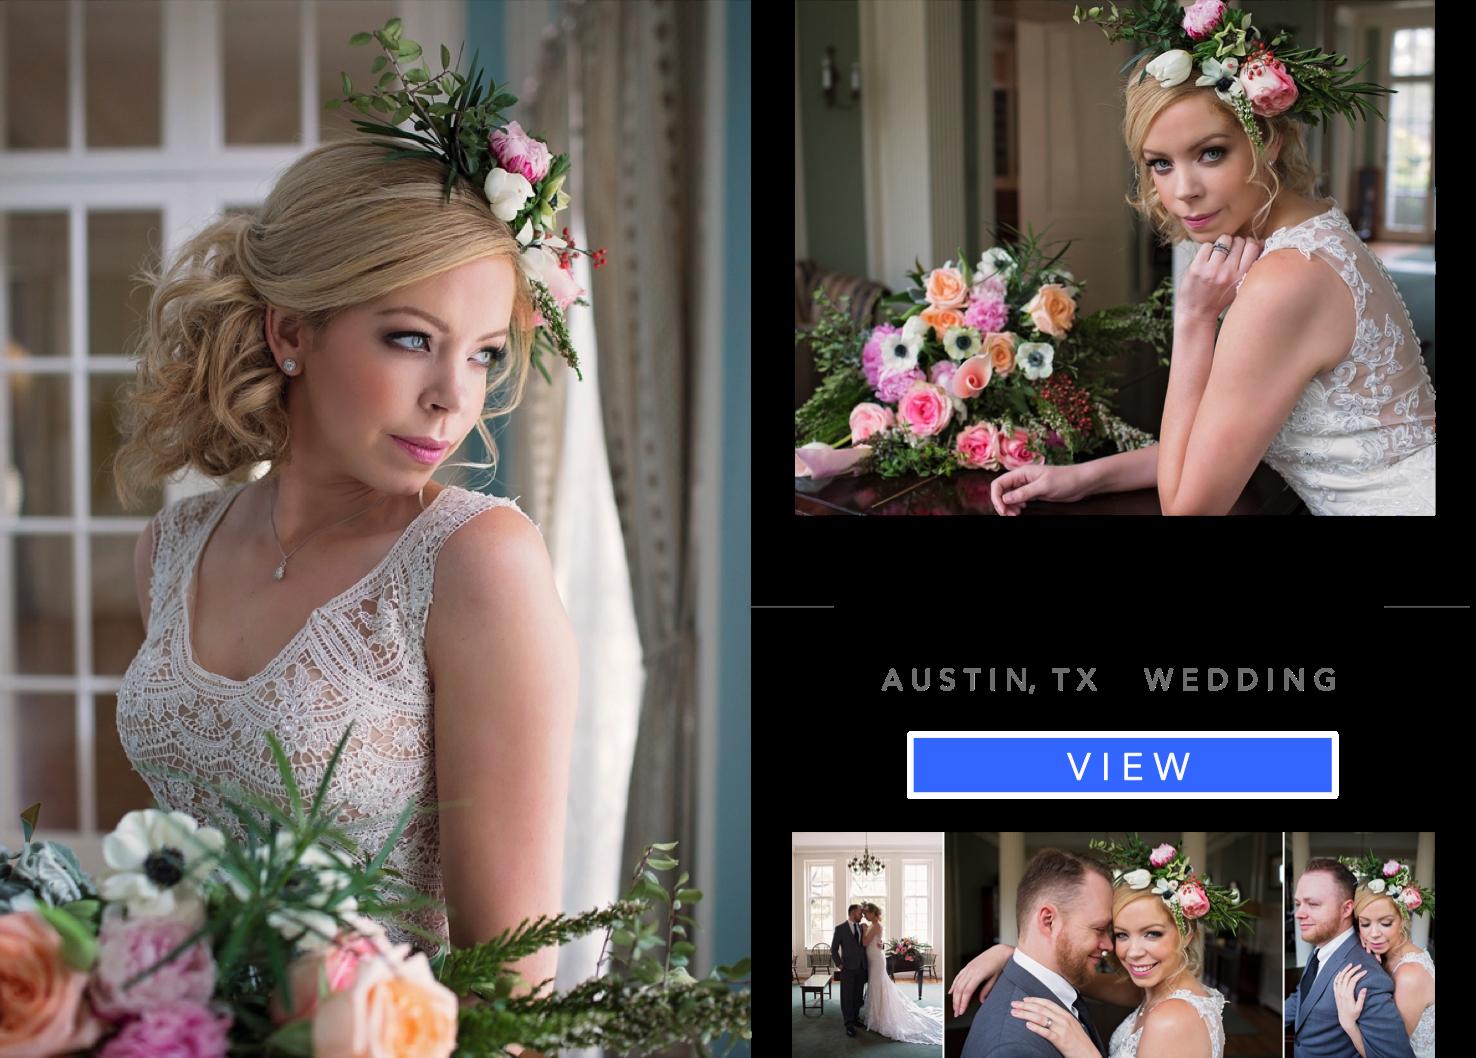 angies-floral-designs-austin-wedding-el-paso-weddings-el-paso-bridal-bouquet-el-paso-texas-wedding-el-paso-flowershop-florist-bodas-el-paso-bridal-bouquets-bridal-items-shop-79912.png